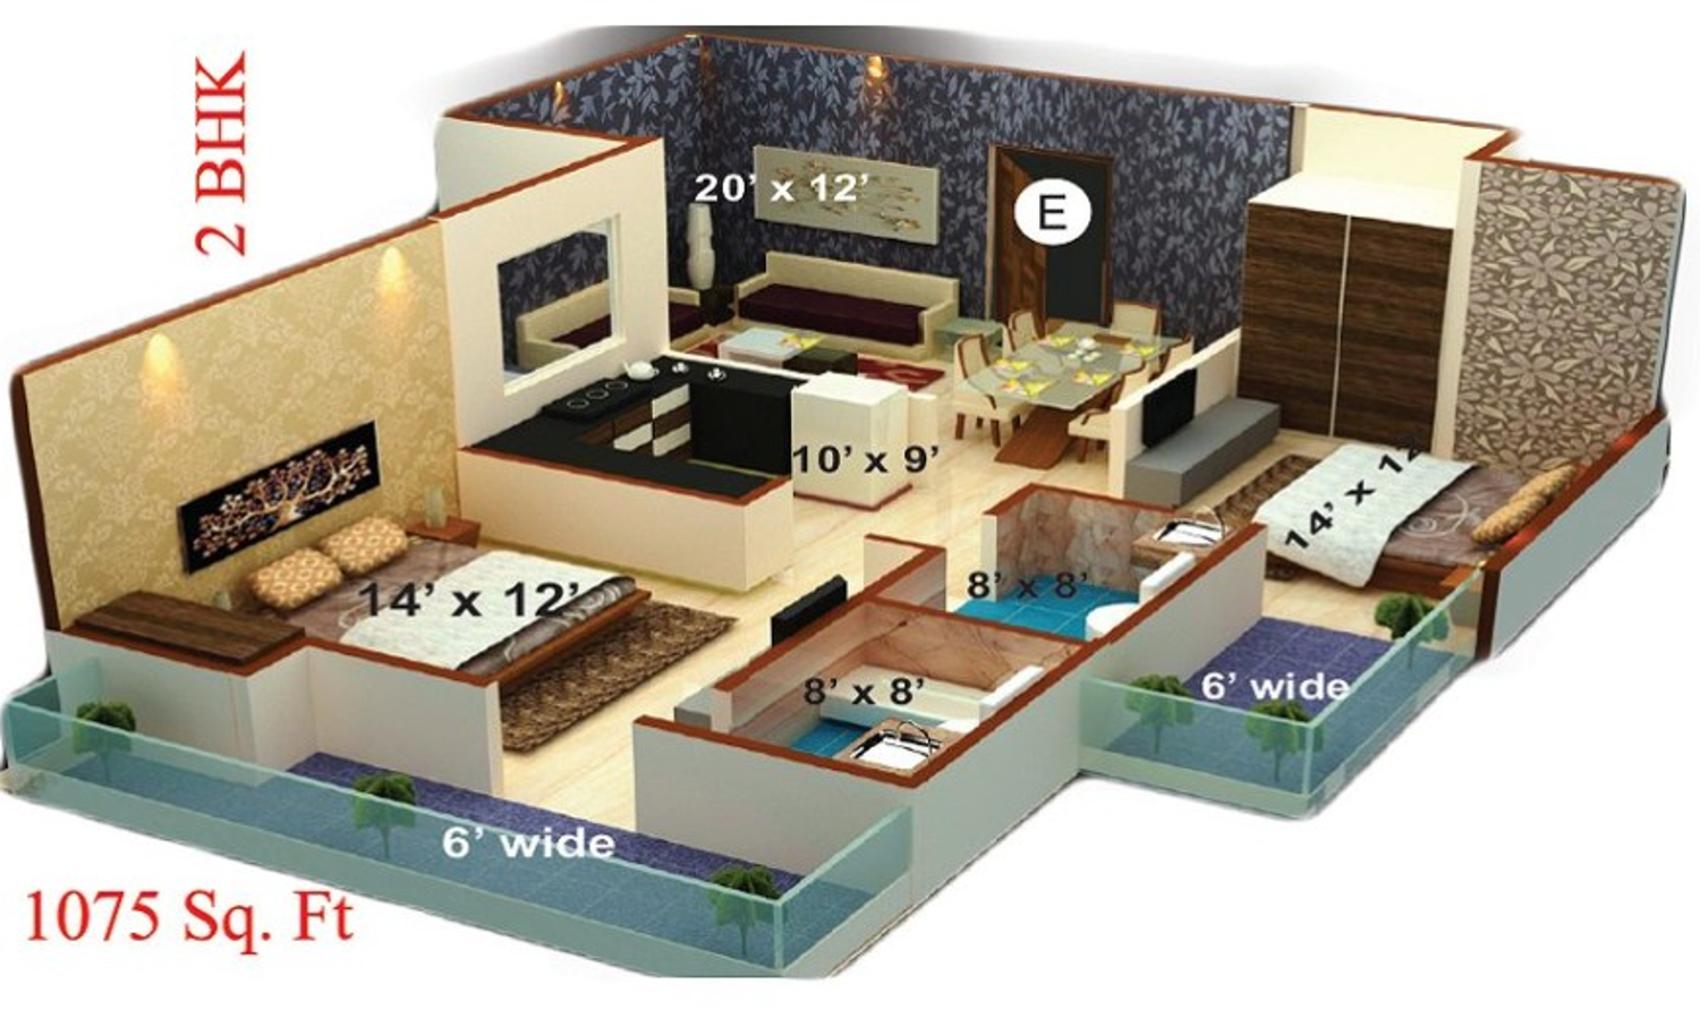 Shree sai victoria heights in zone p ii delhi price for 100 floors floor 89